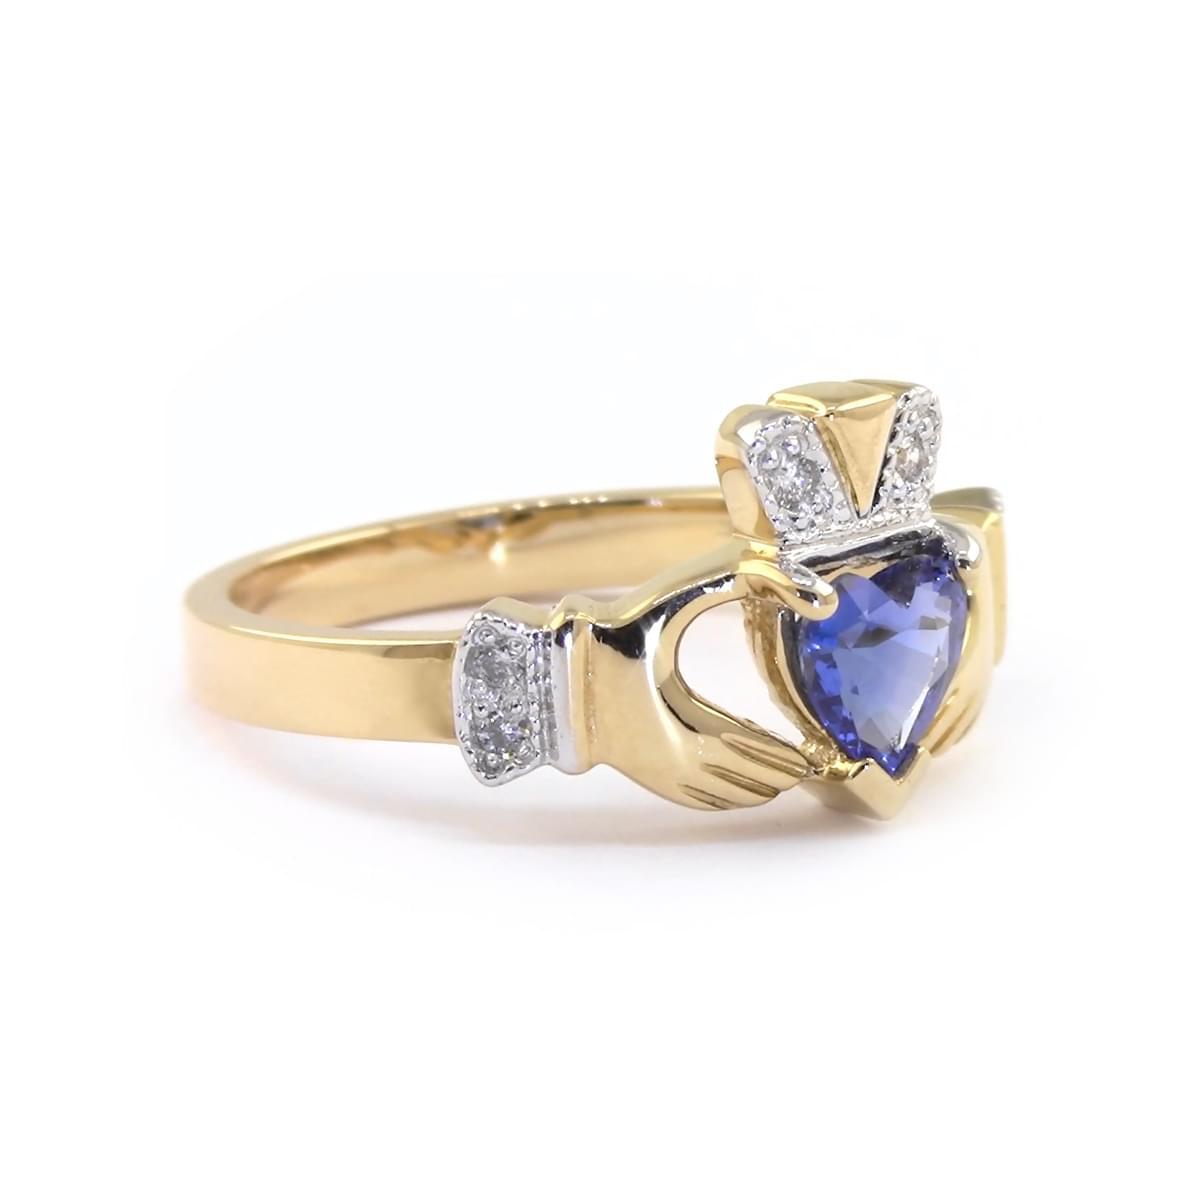 Heartshape Sapphire Diamond Claddagh Engagement Ring